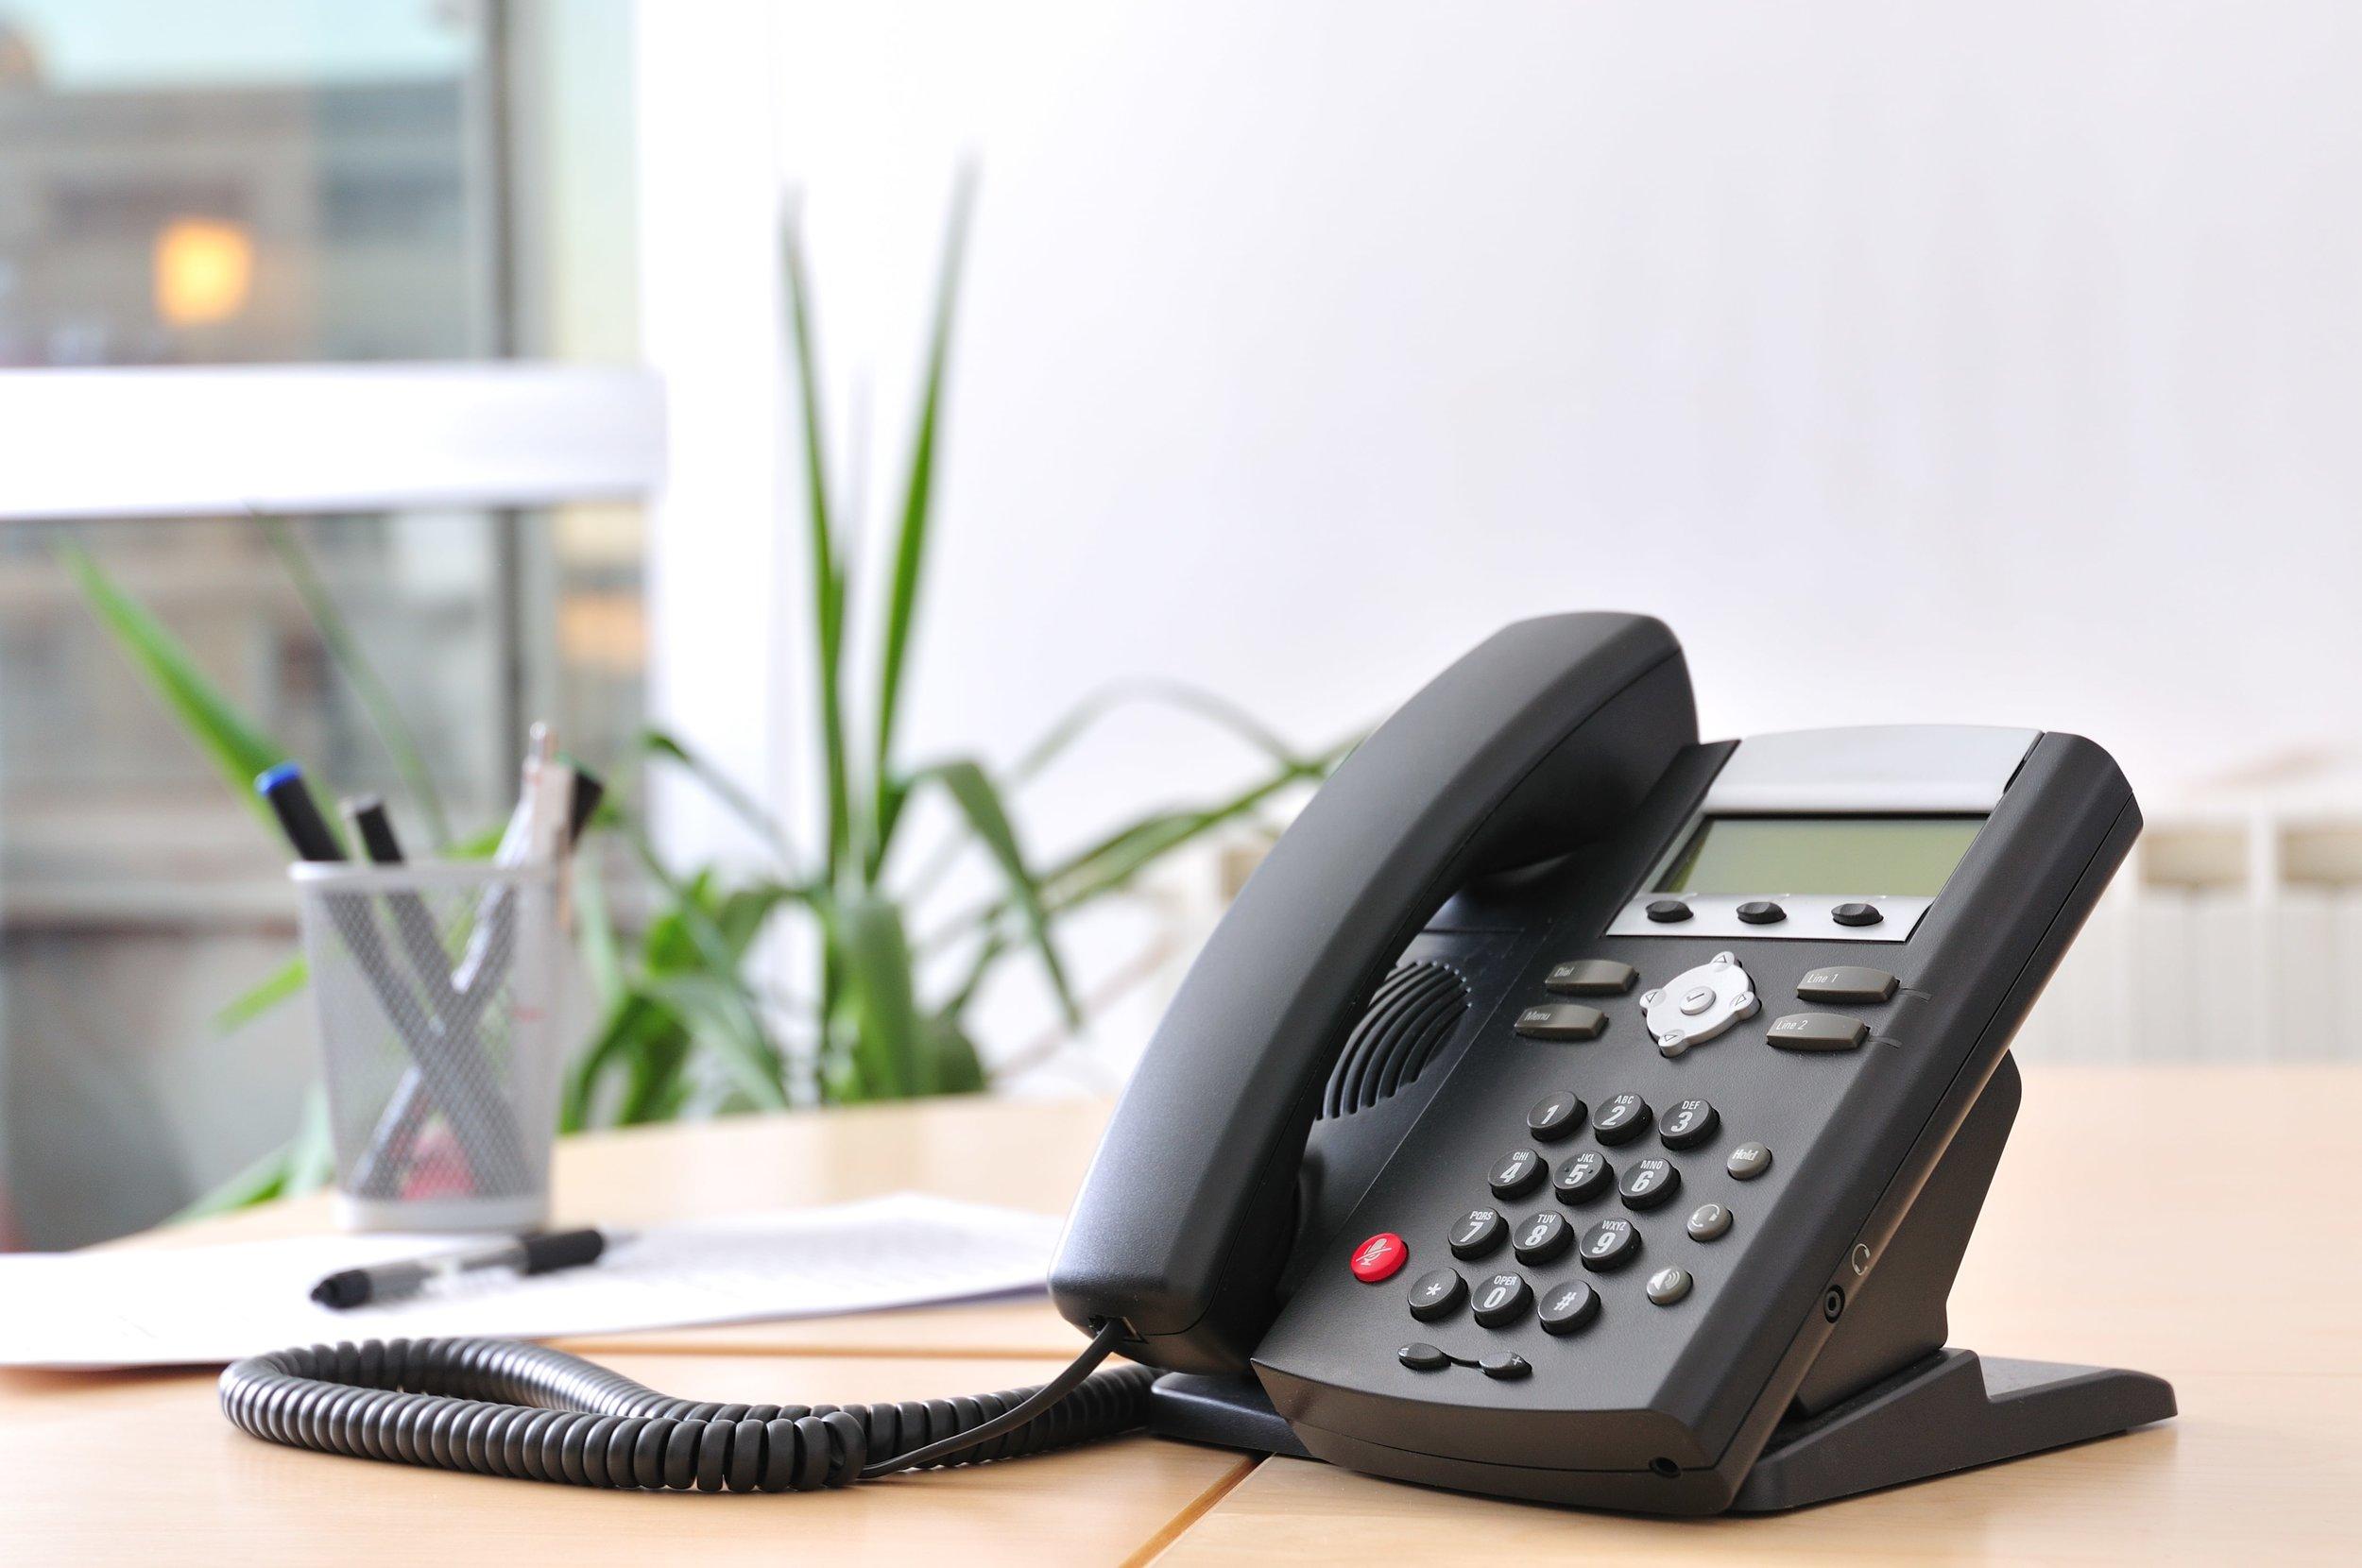 Canva - bytek-VoIP-Phones-min.jpg